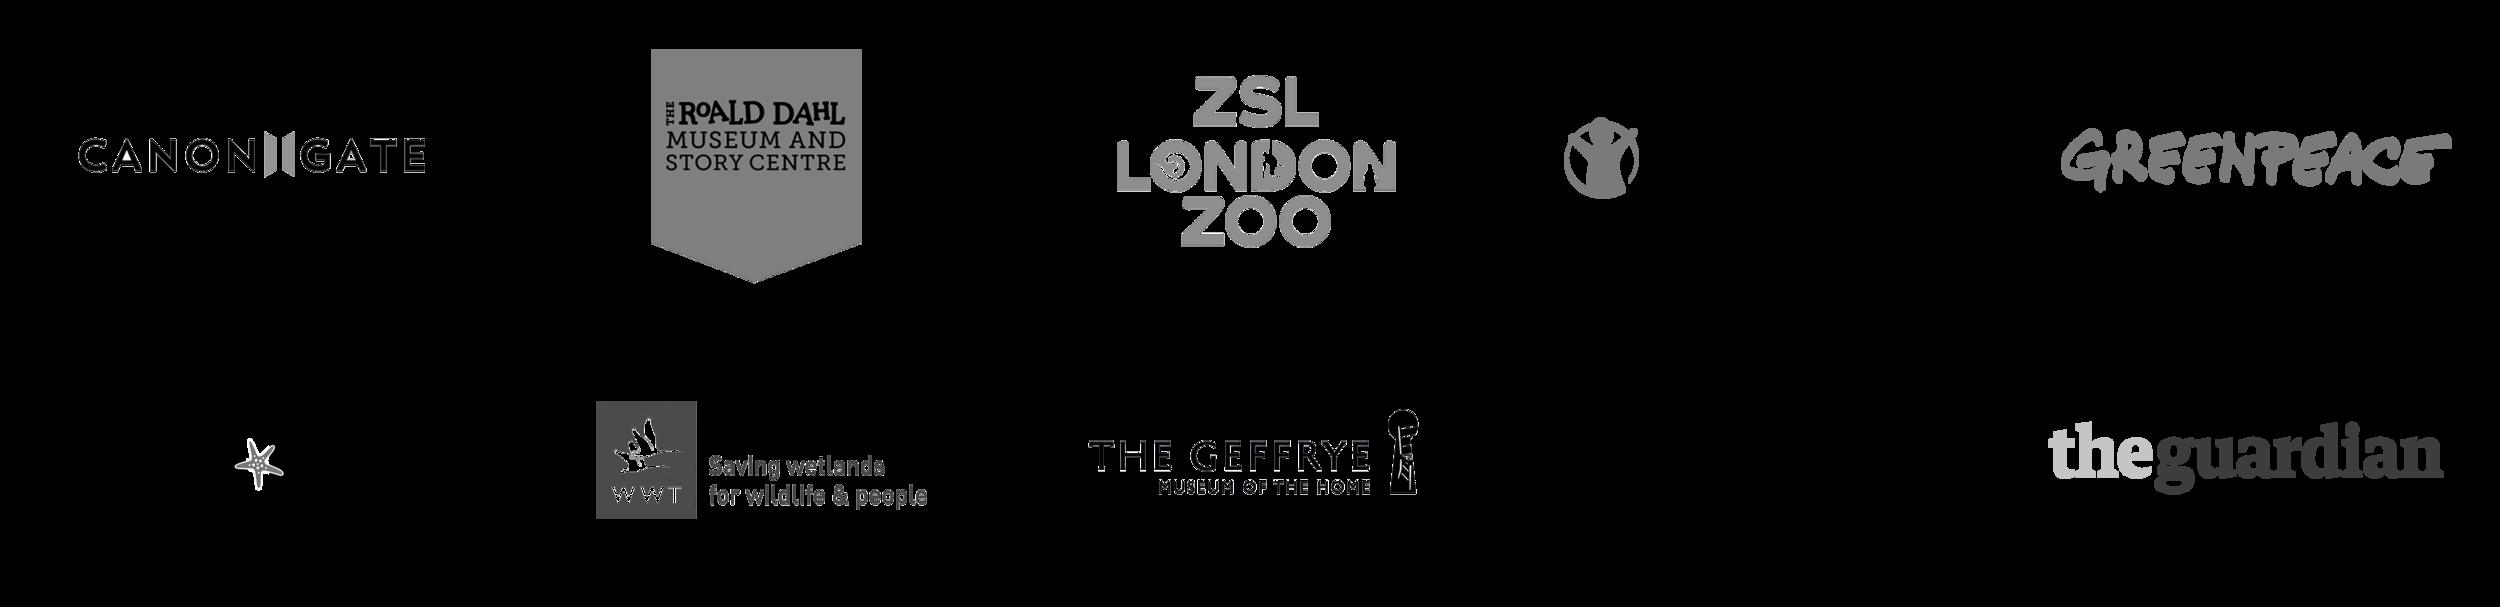 client logo block transparent 2.png